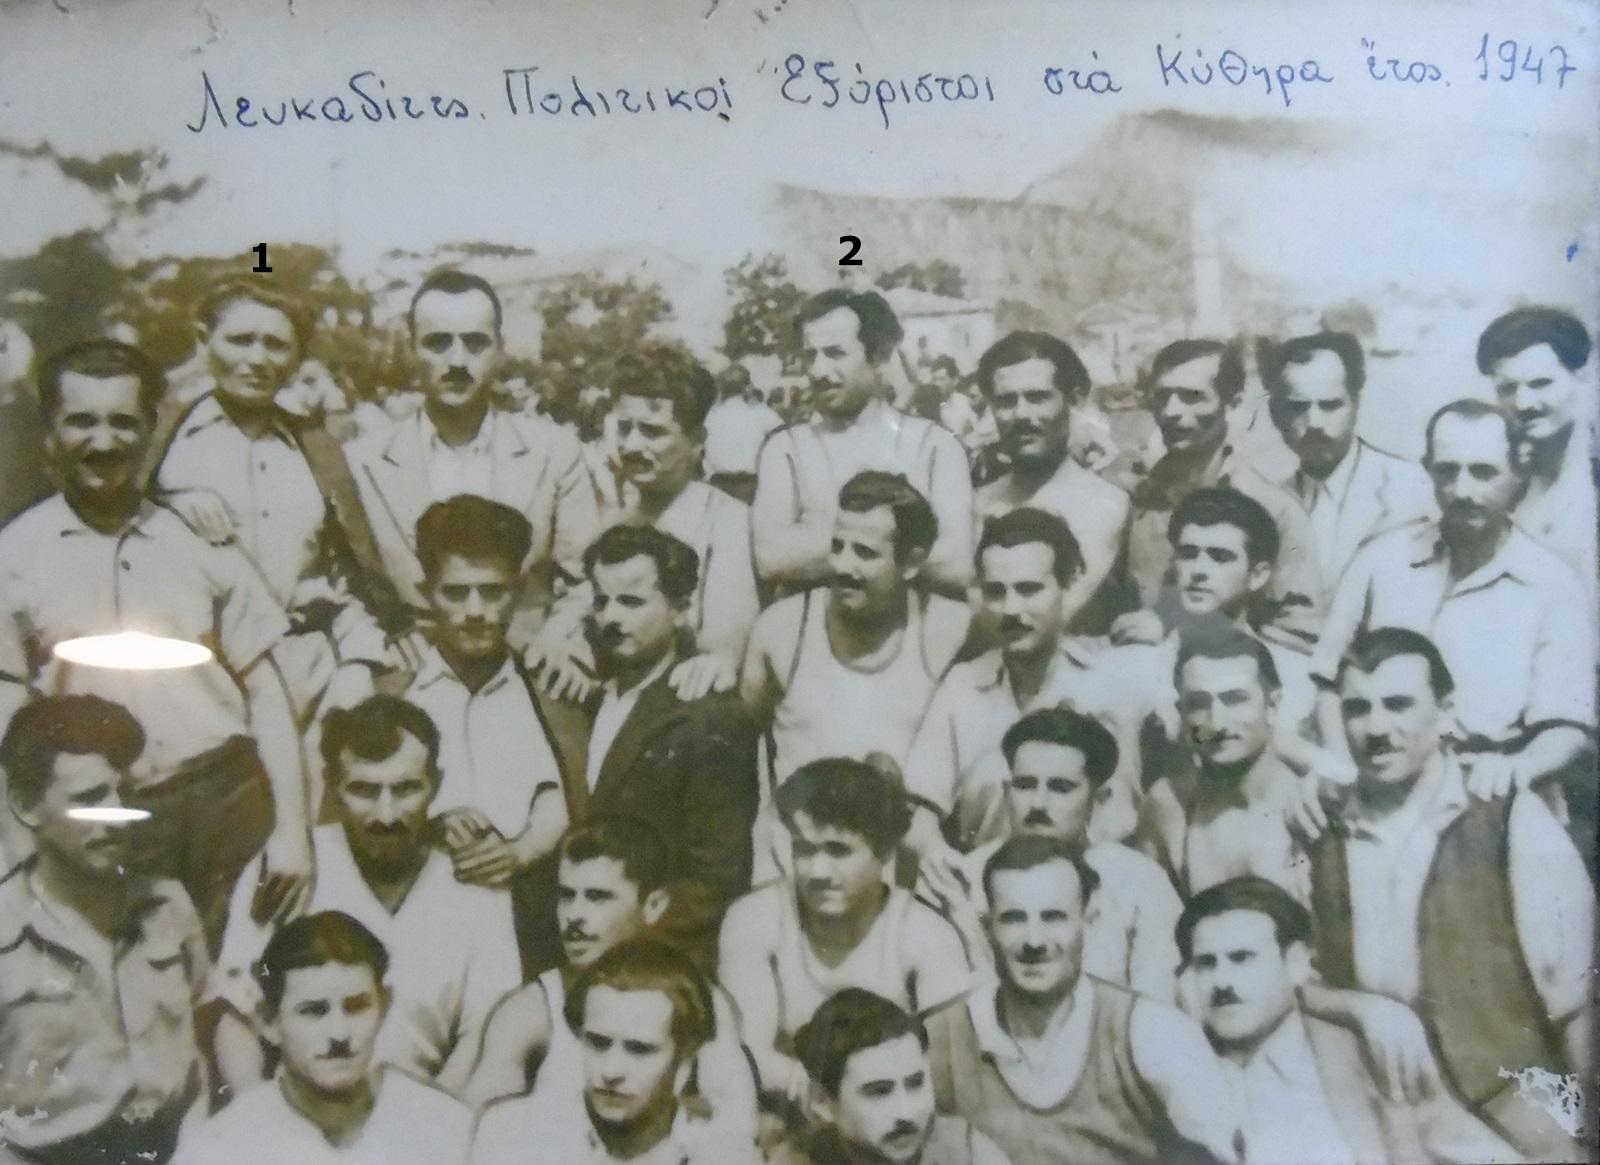 Lefkadites_exoristoi_Kythira_1947